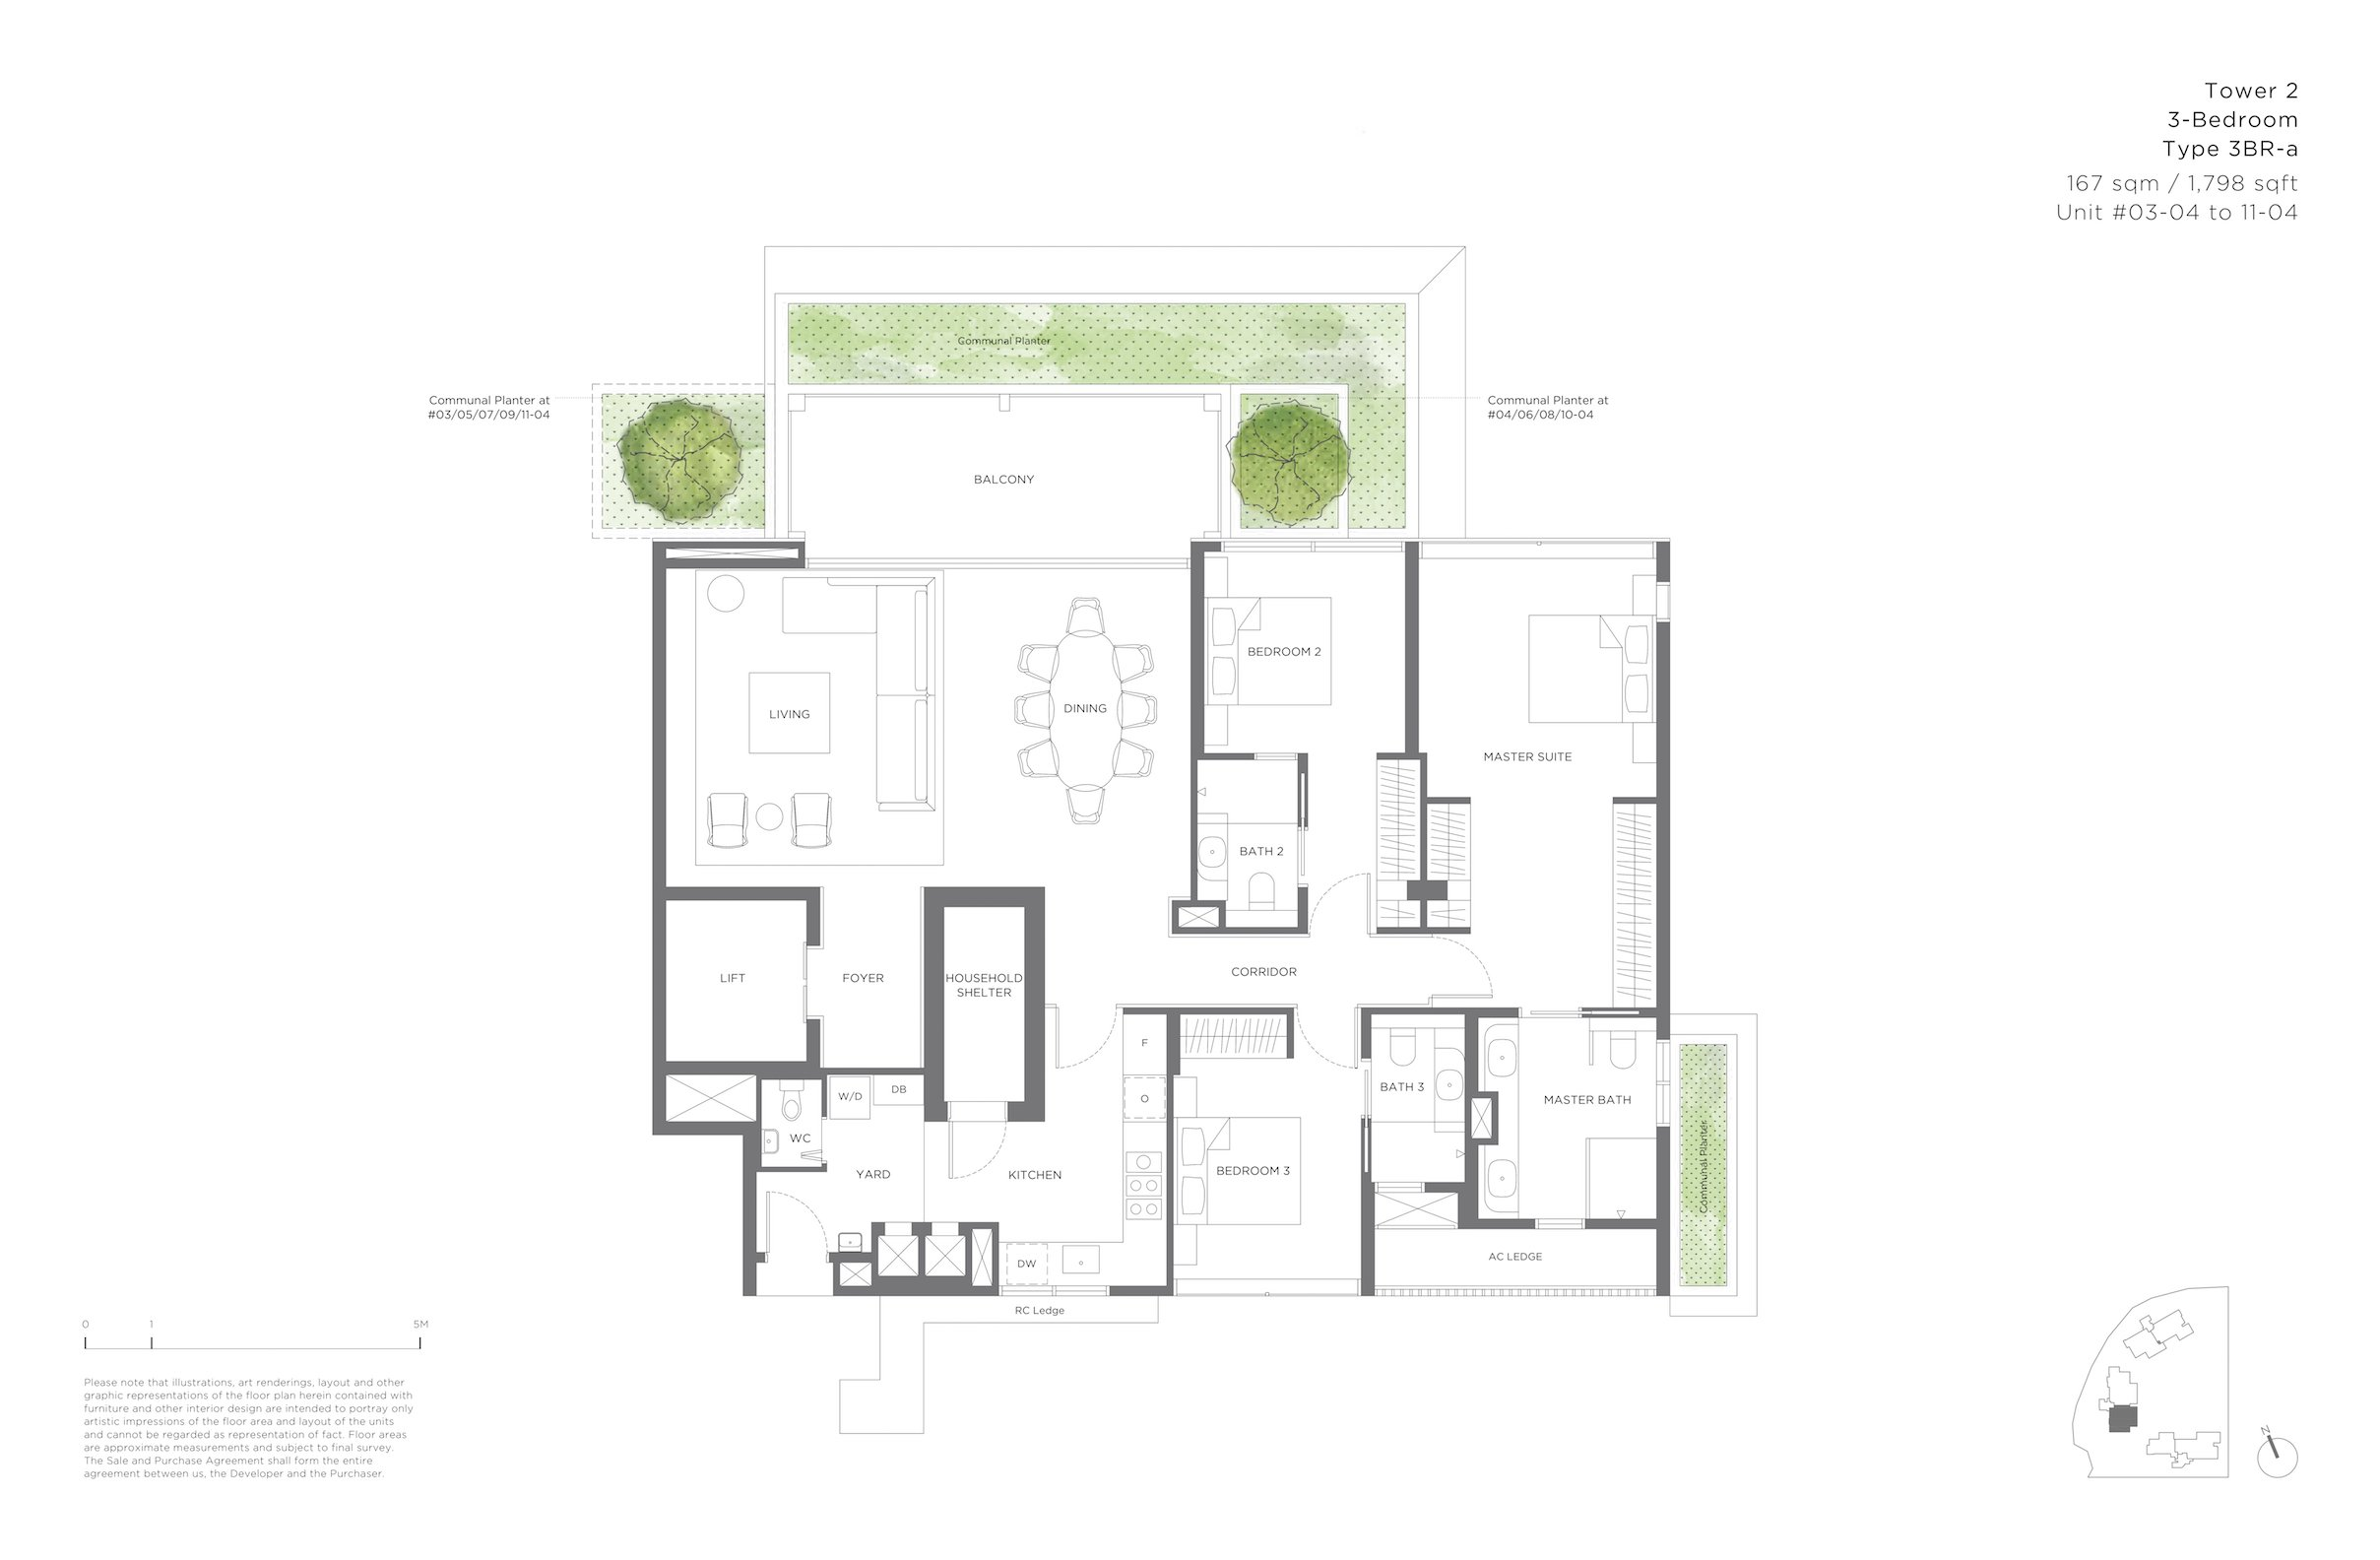 15 Holland Hill 荷兰山公寓3-bedroom 3br-a